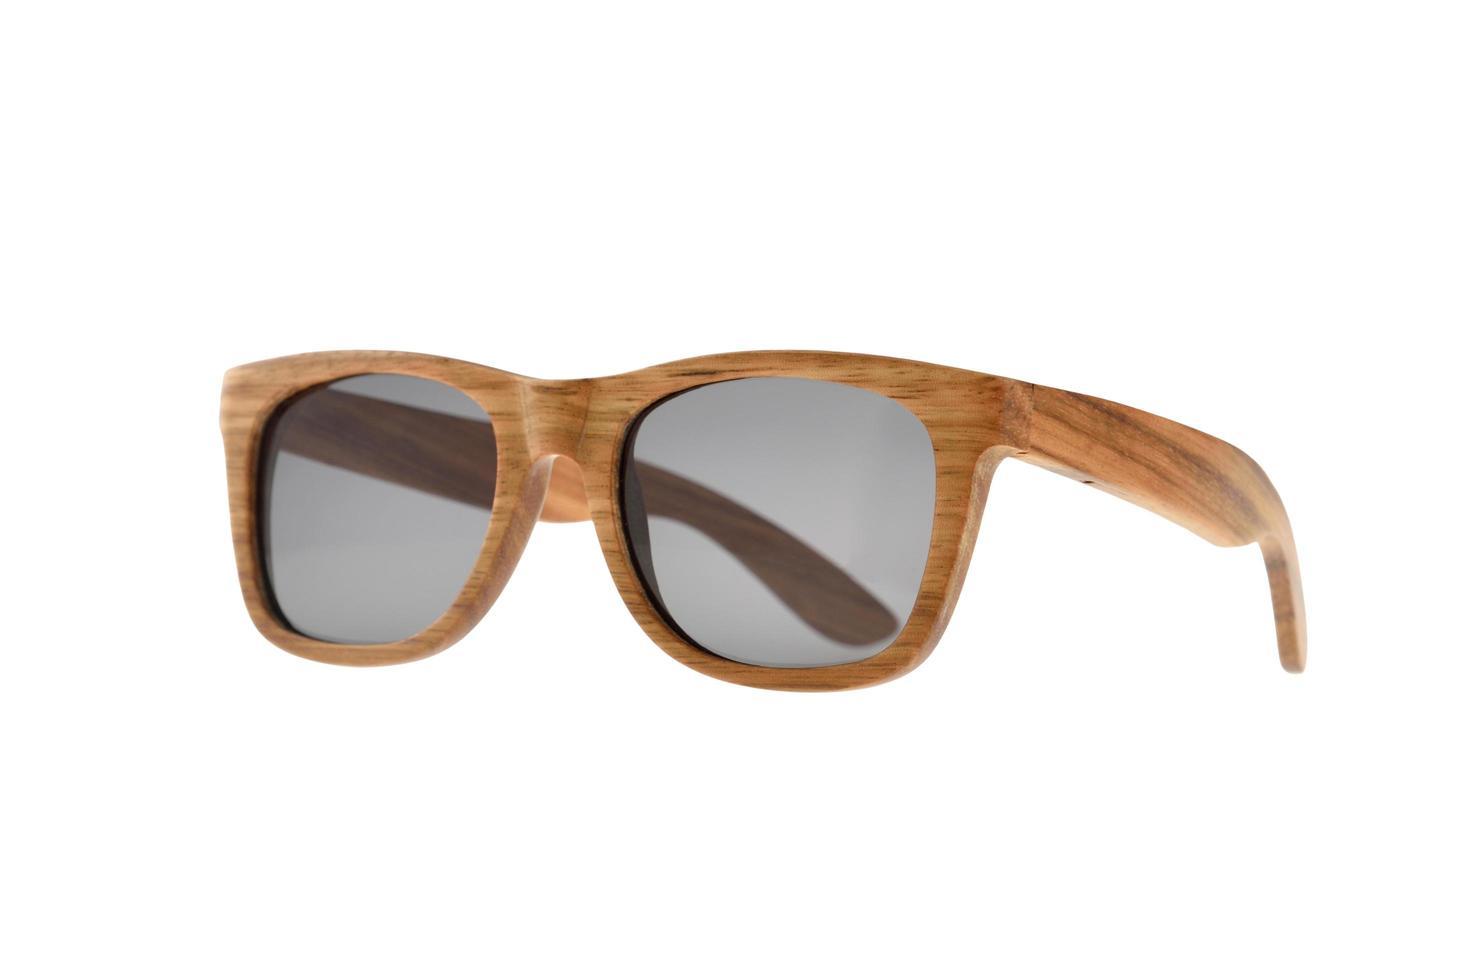 Natural wood-framed sunglasses photo